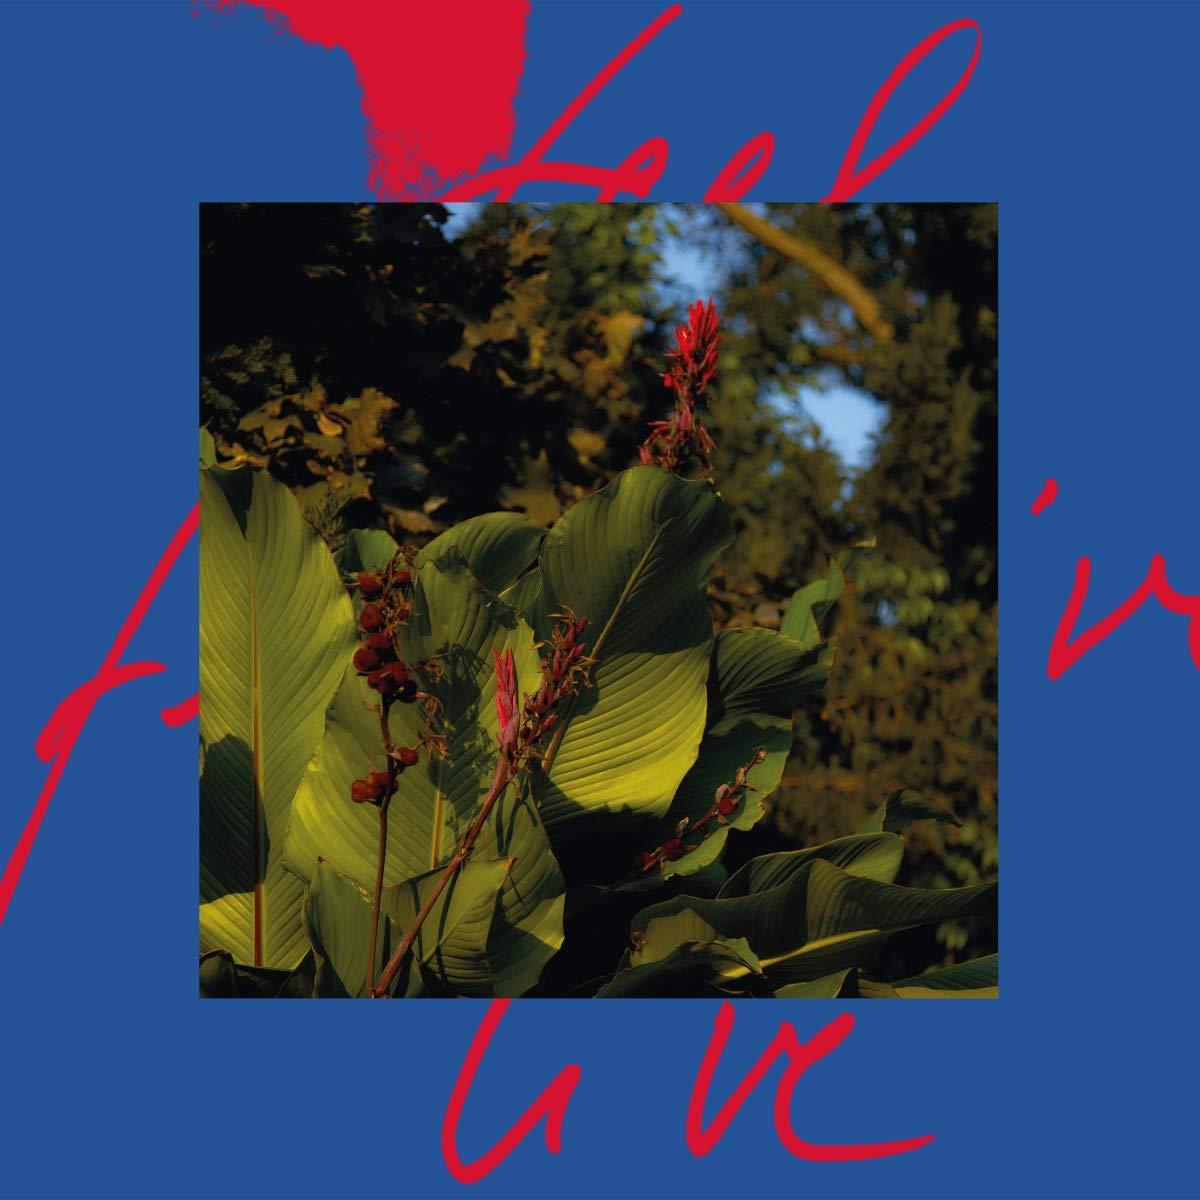 Vinilo : Massimiliano Pagliara - Feel Live (2 Pack)